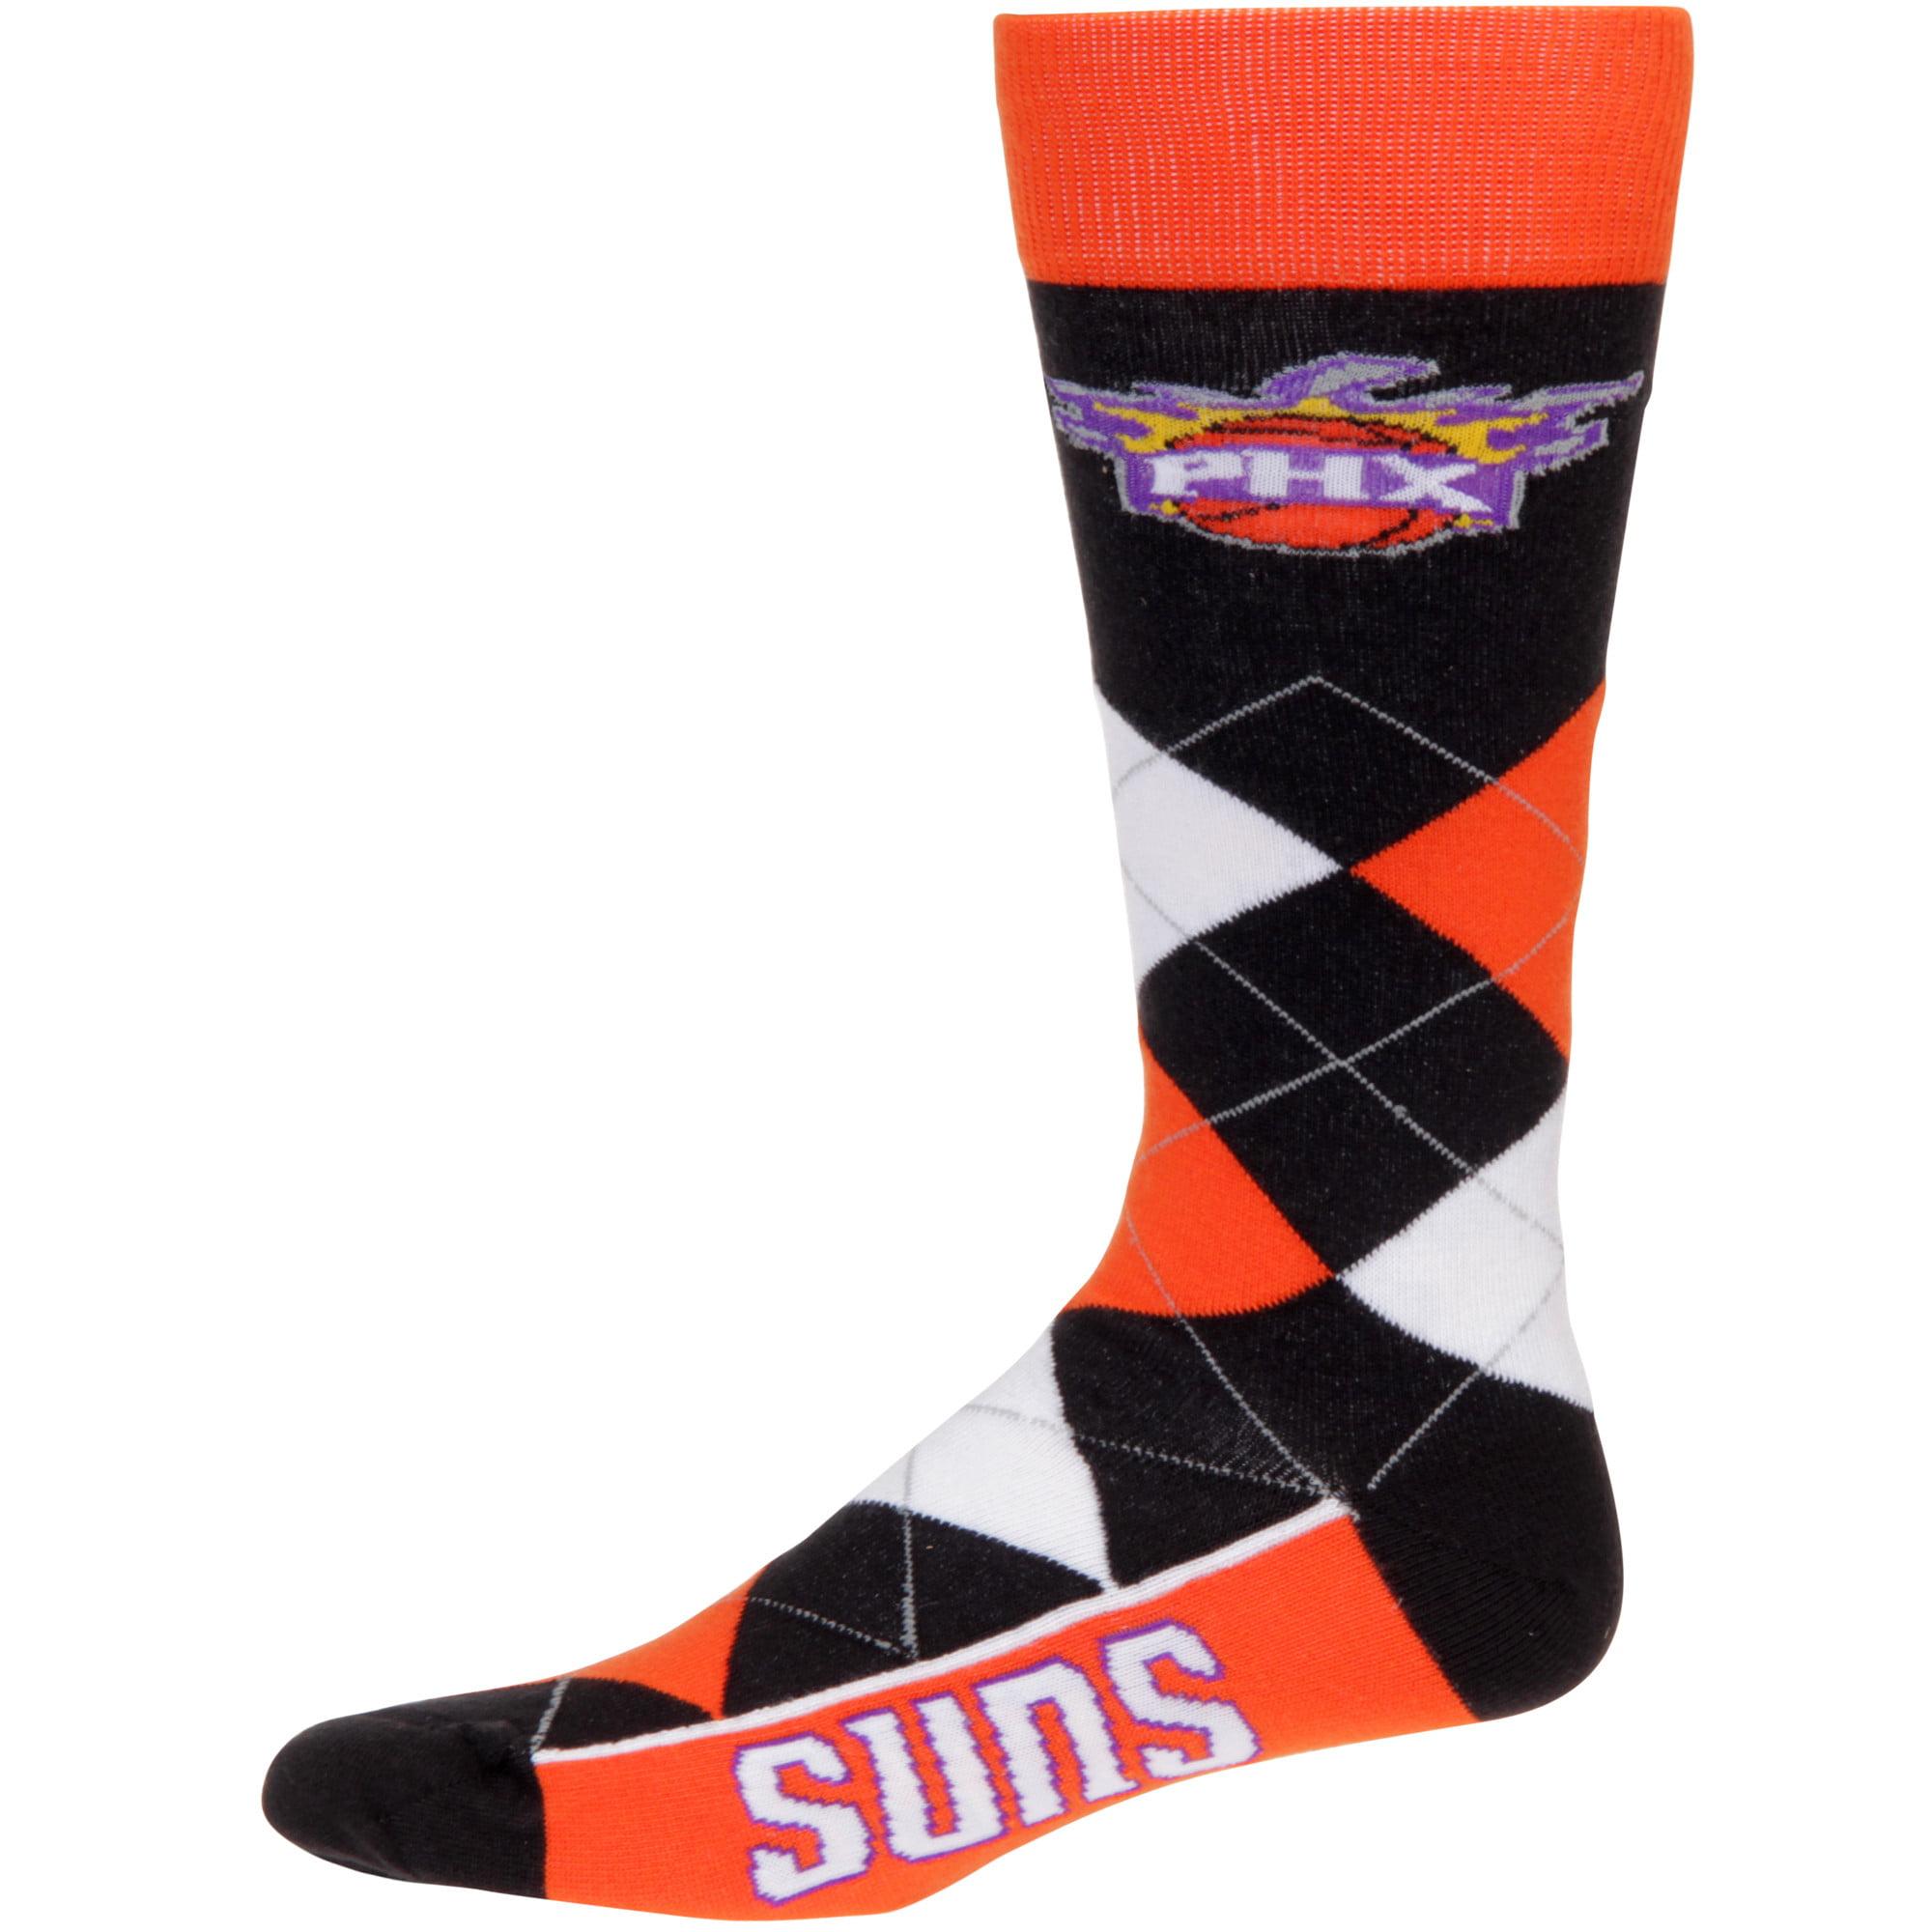 Phoenix Suns For Bare Feet Argyle Crew Socks - No Size